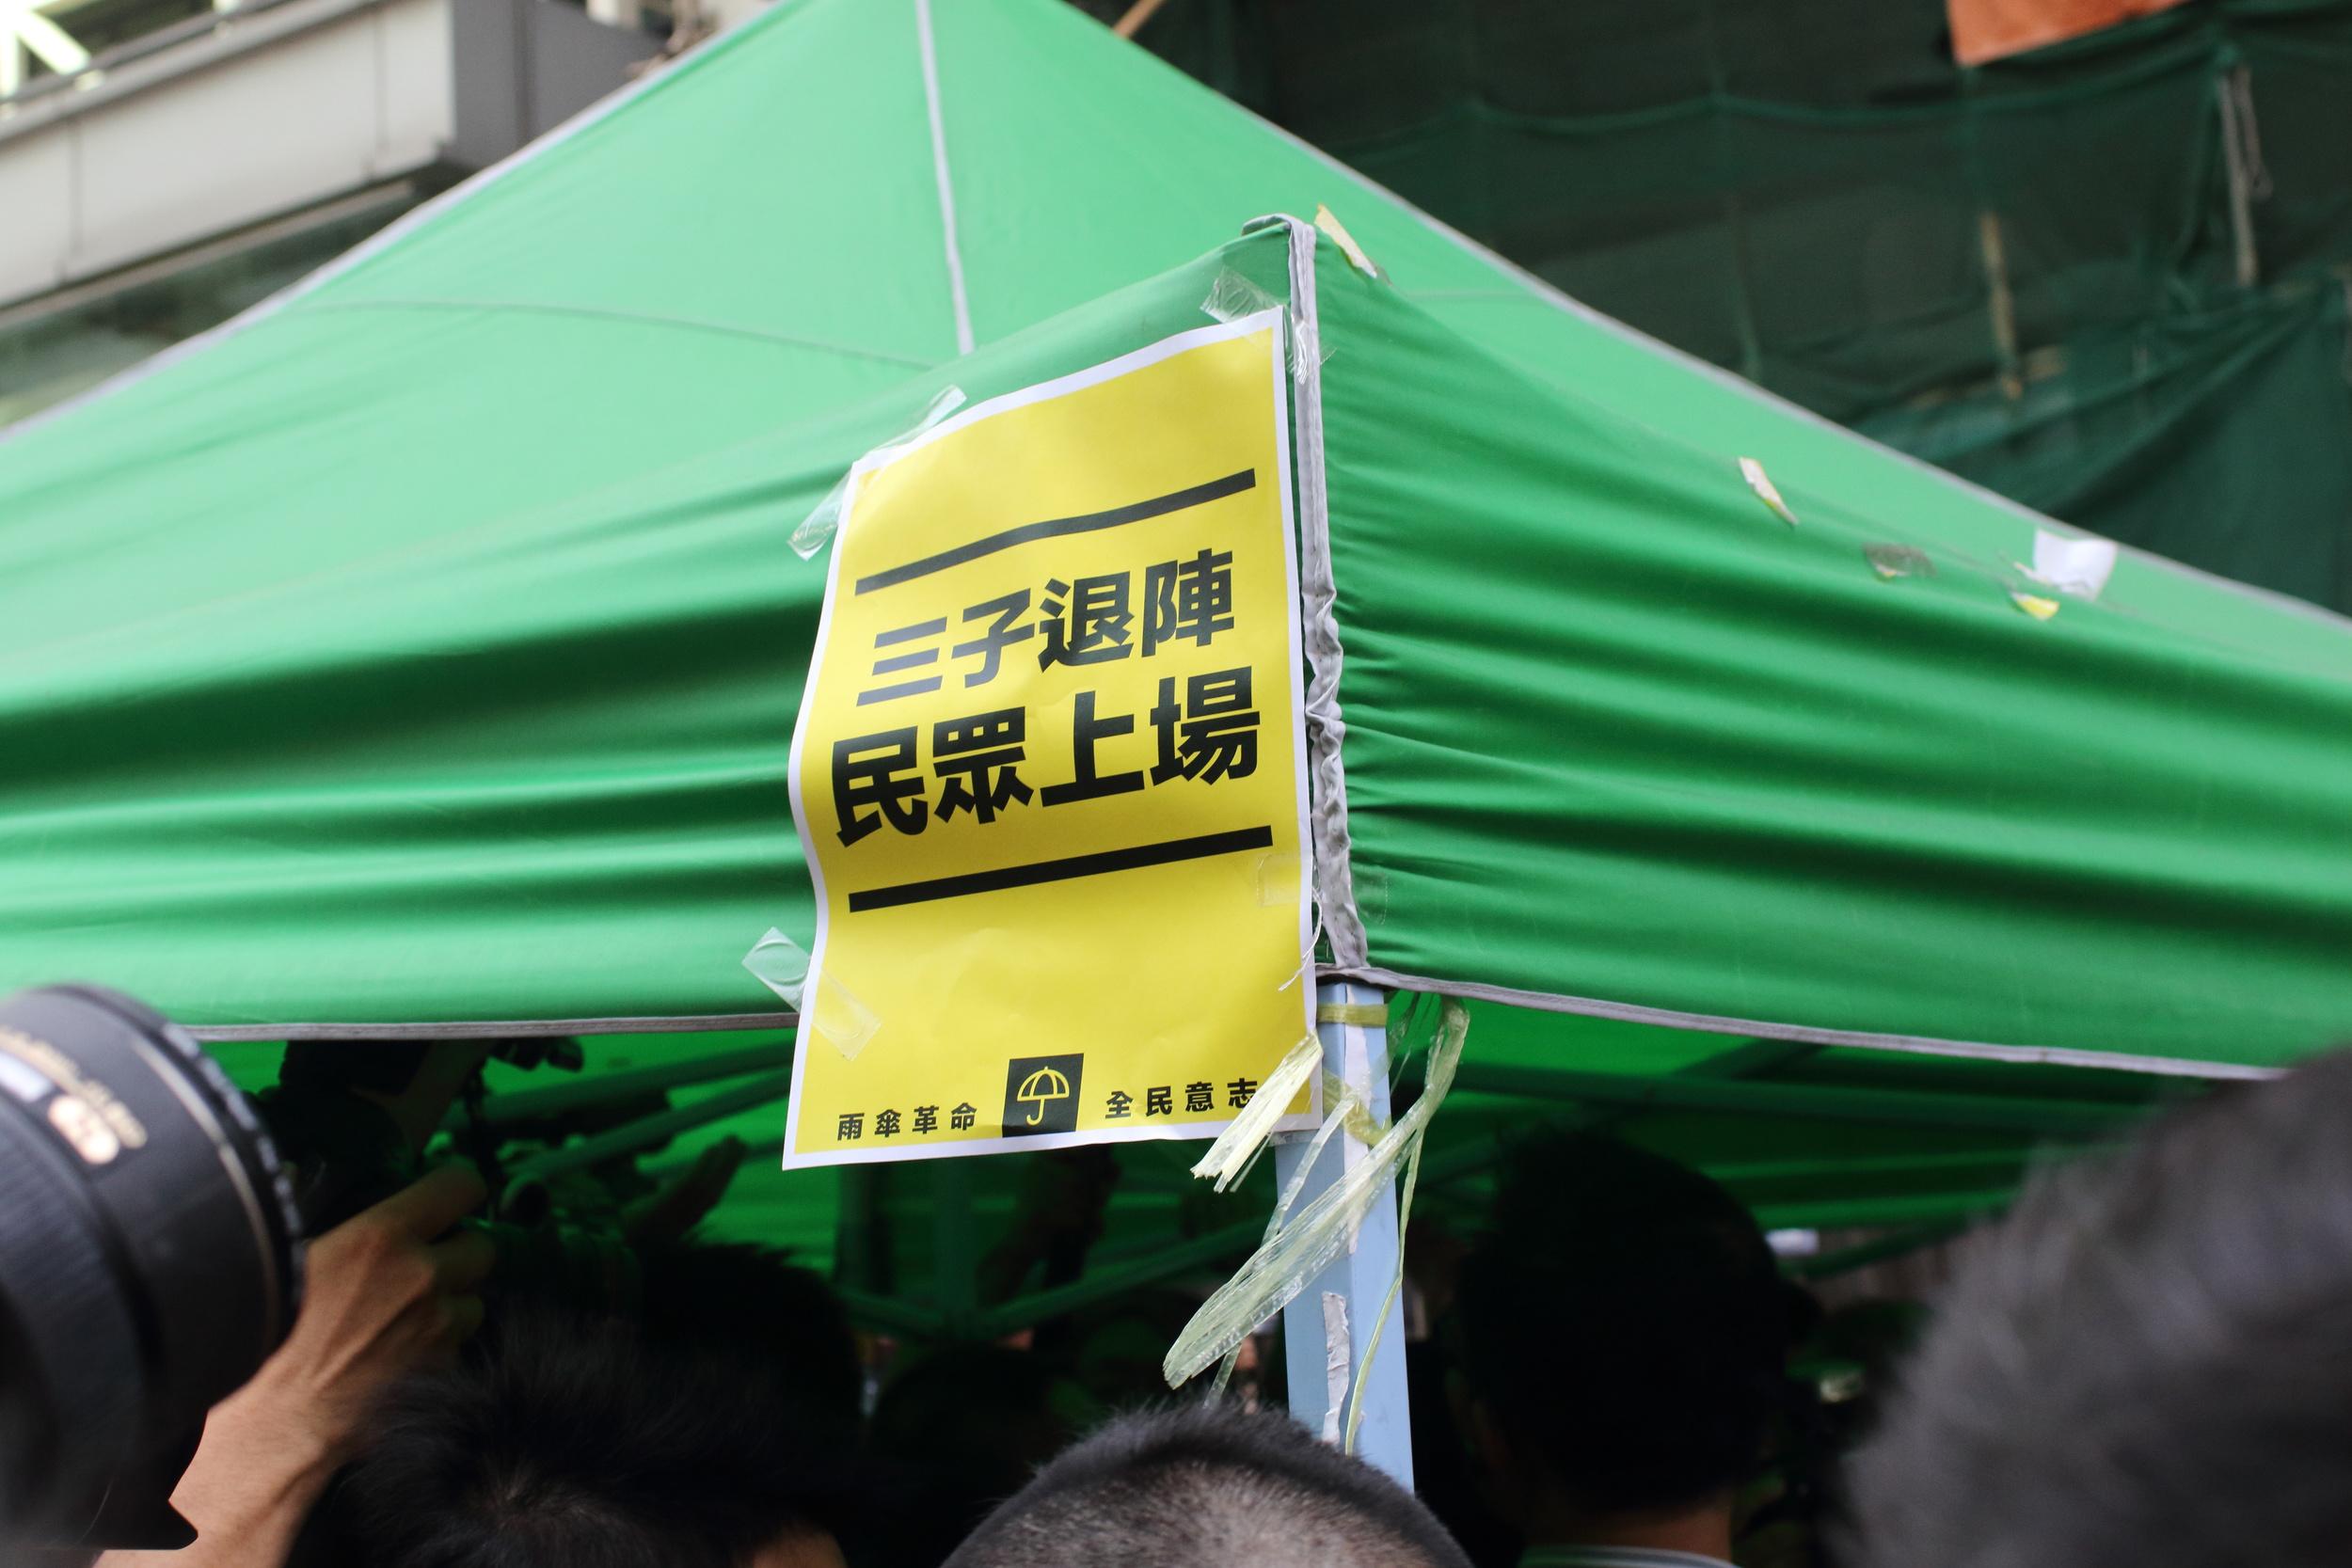 jfung1 Mongkok Argyle Clearance27.JPG